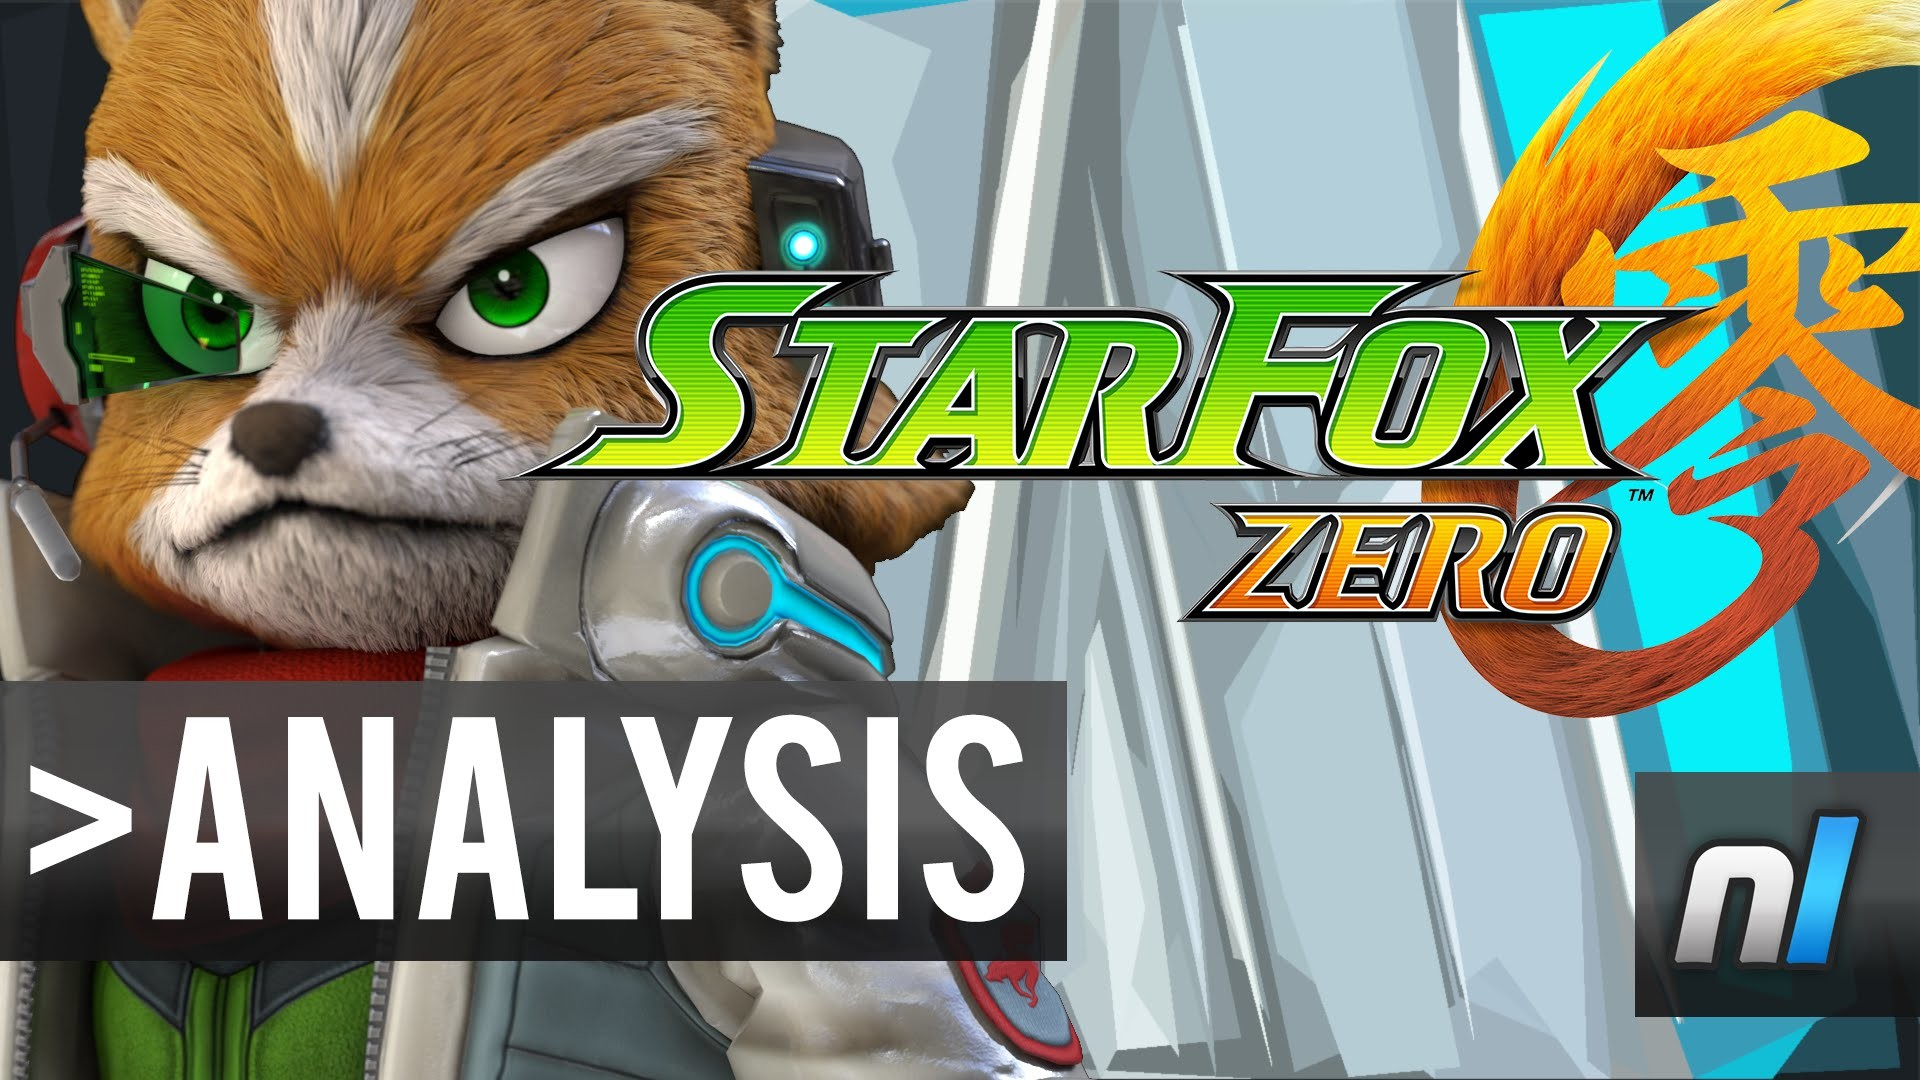 Star Fox Zero Analysis: Everything We Know So Far